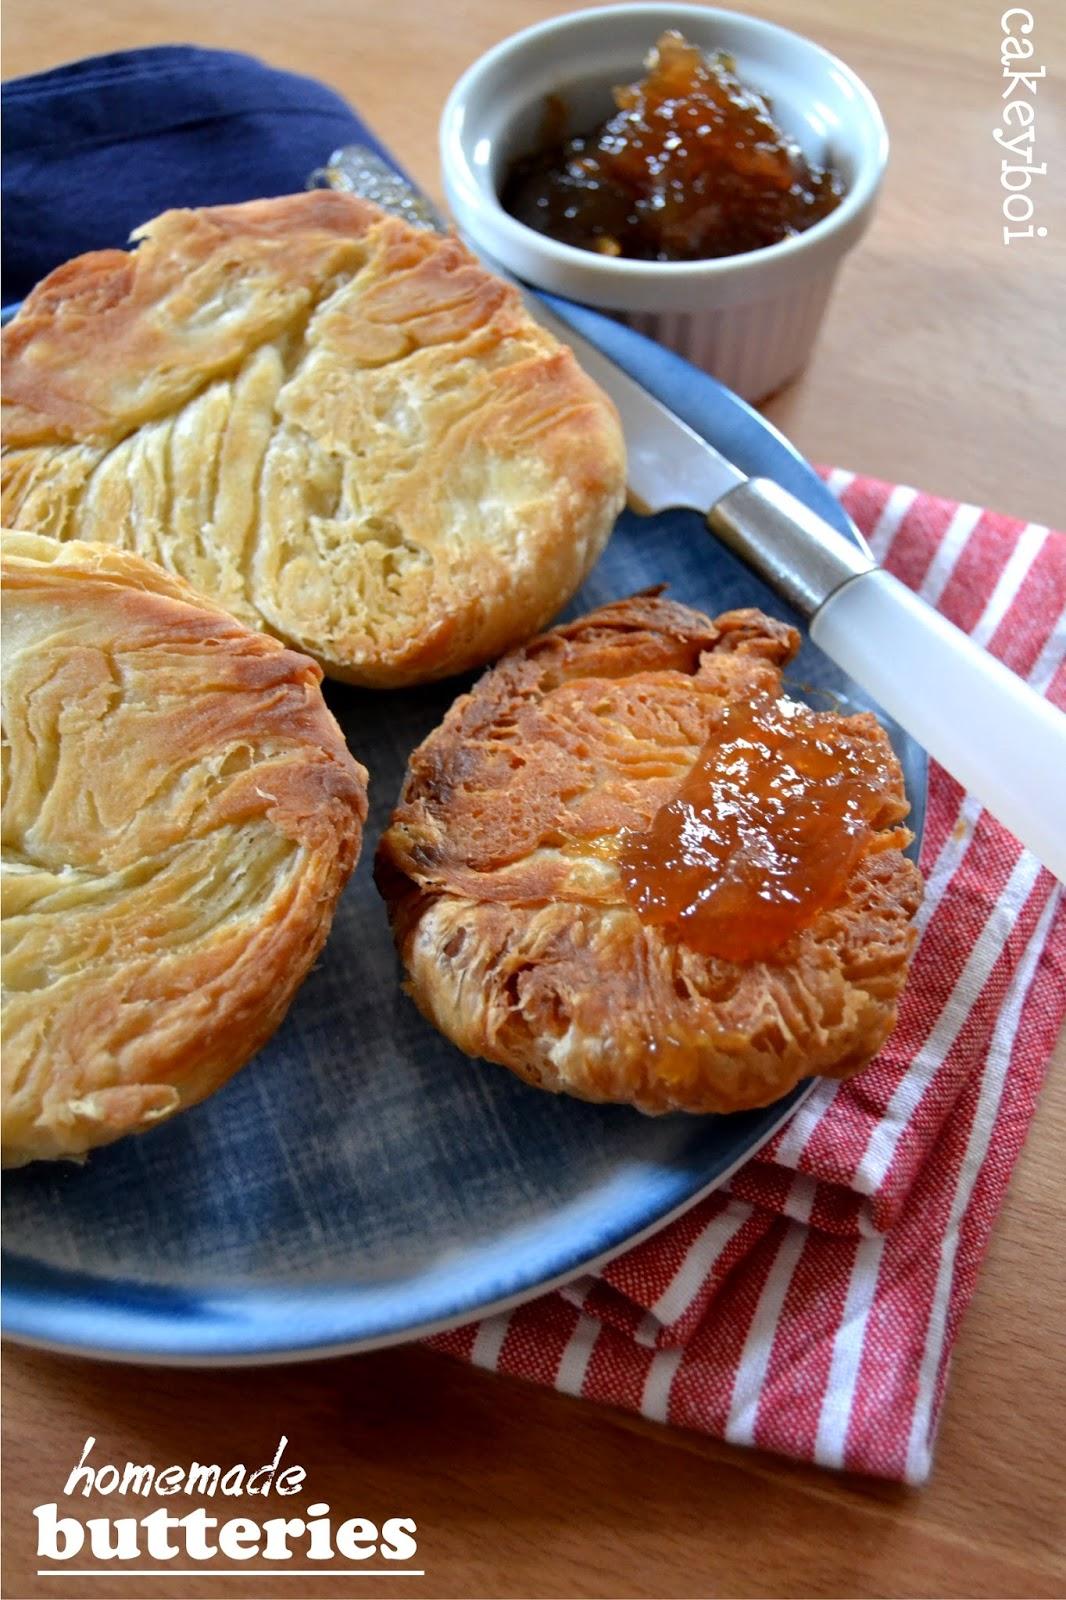 Rowie S Cakes Recipes